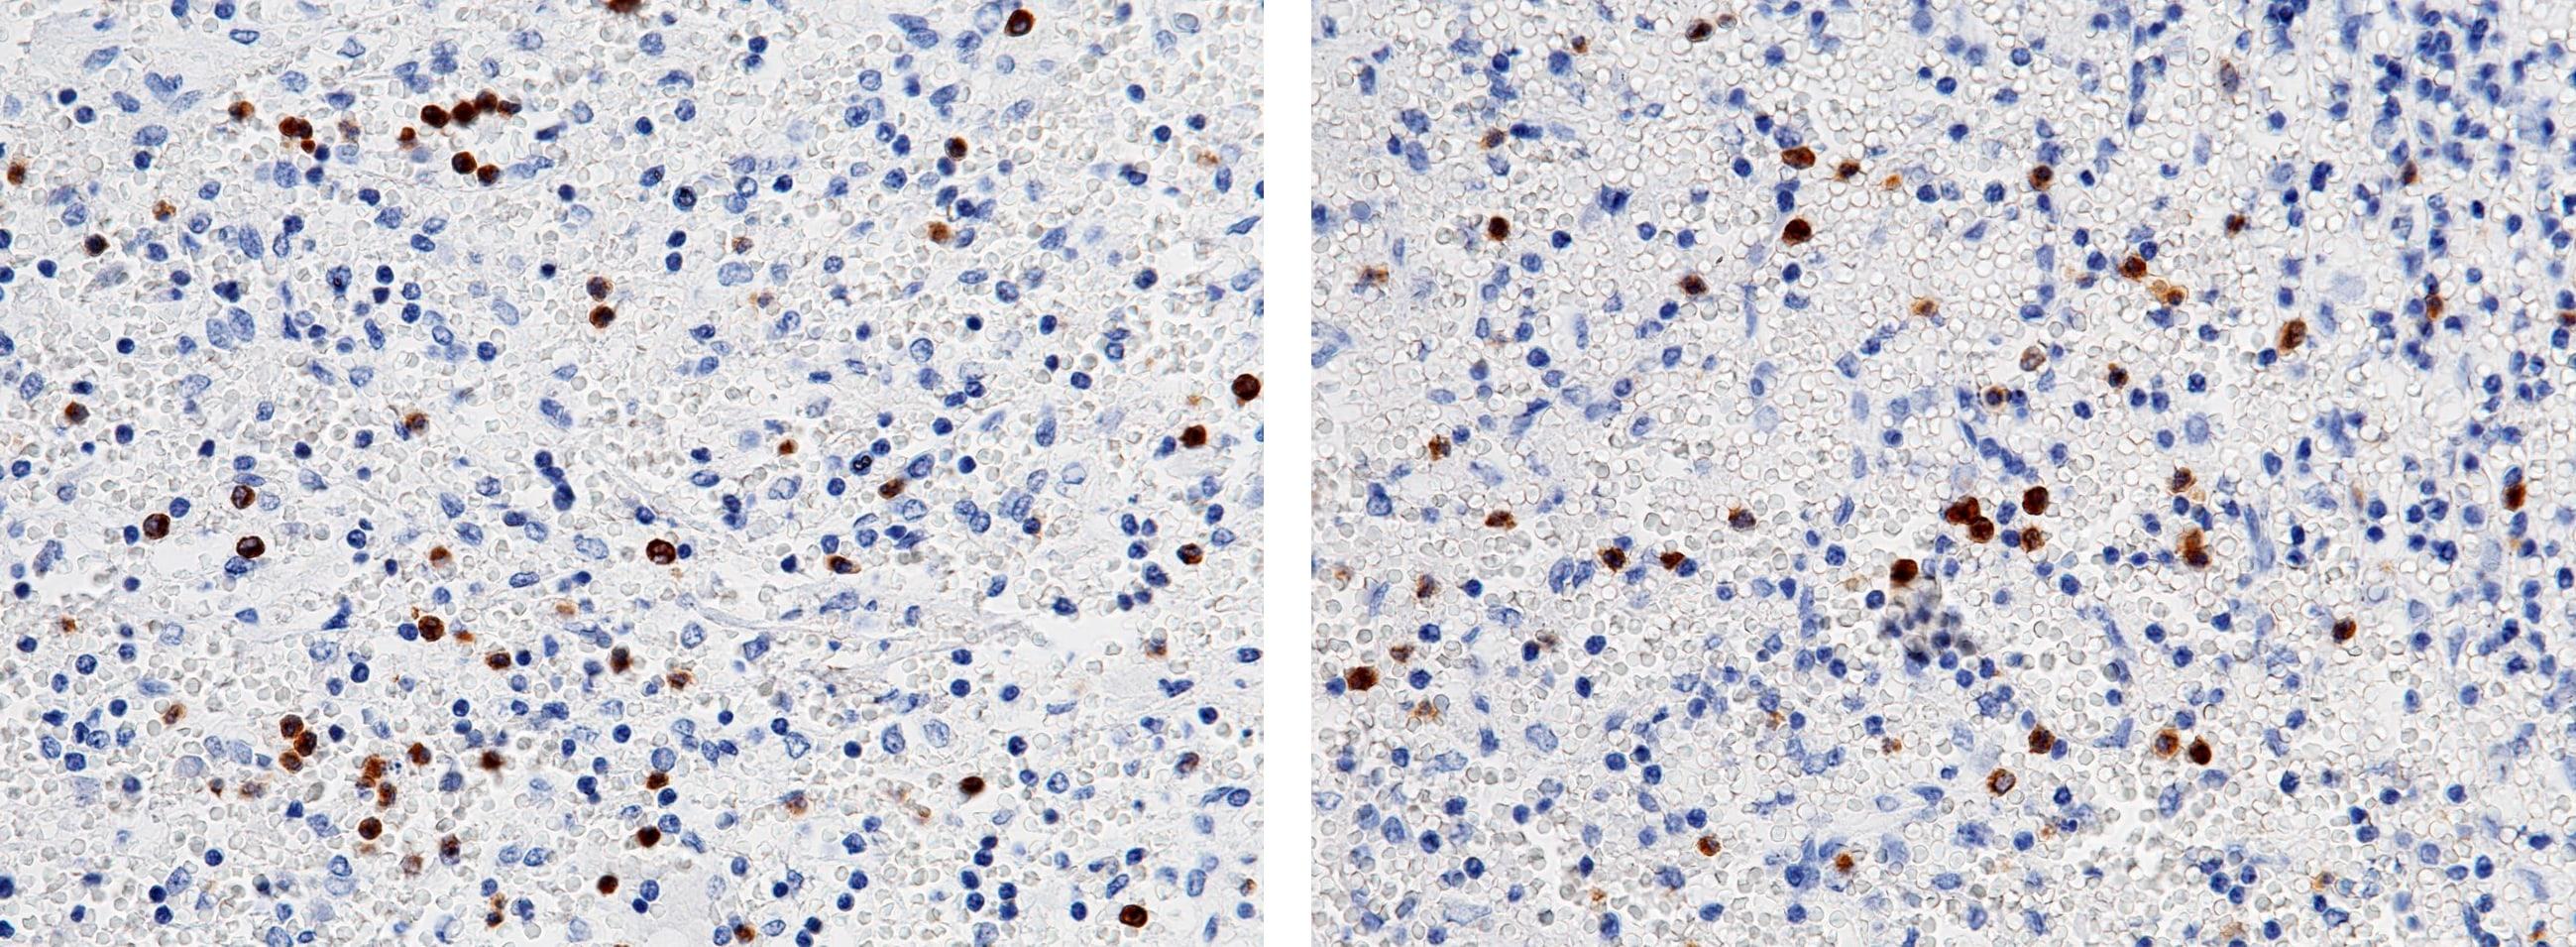 FCN1 Antibody in Immunohistochemistry (Paraffin) (IHC (P))